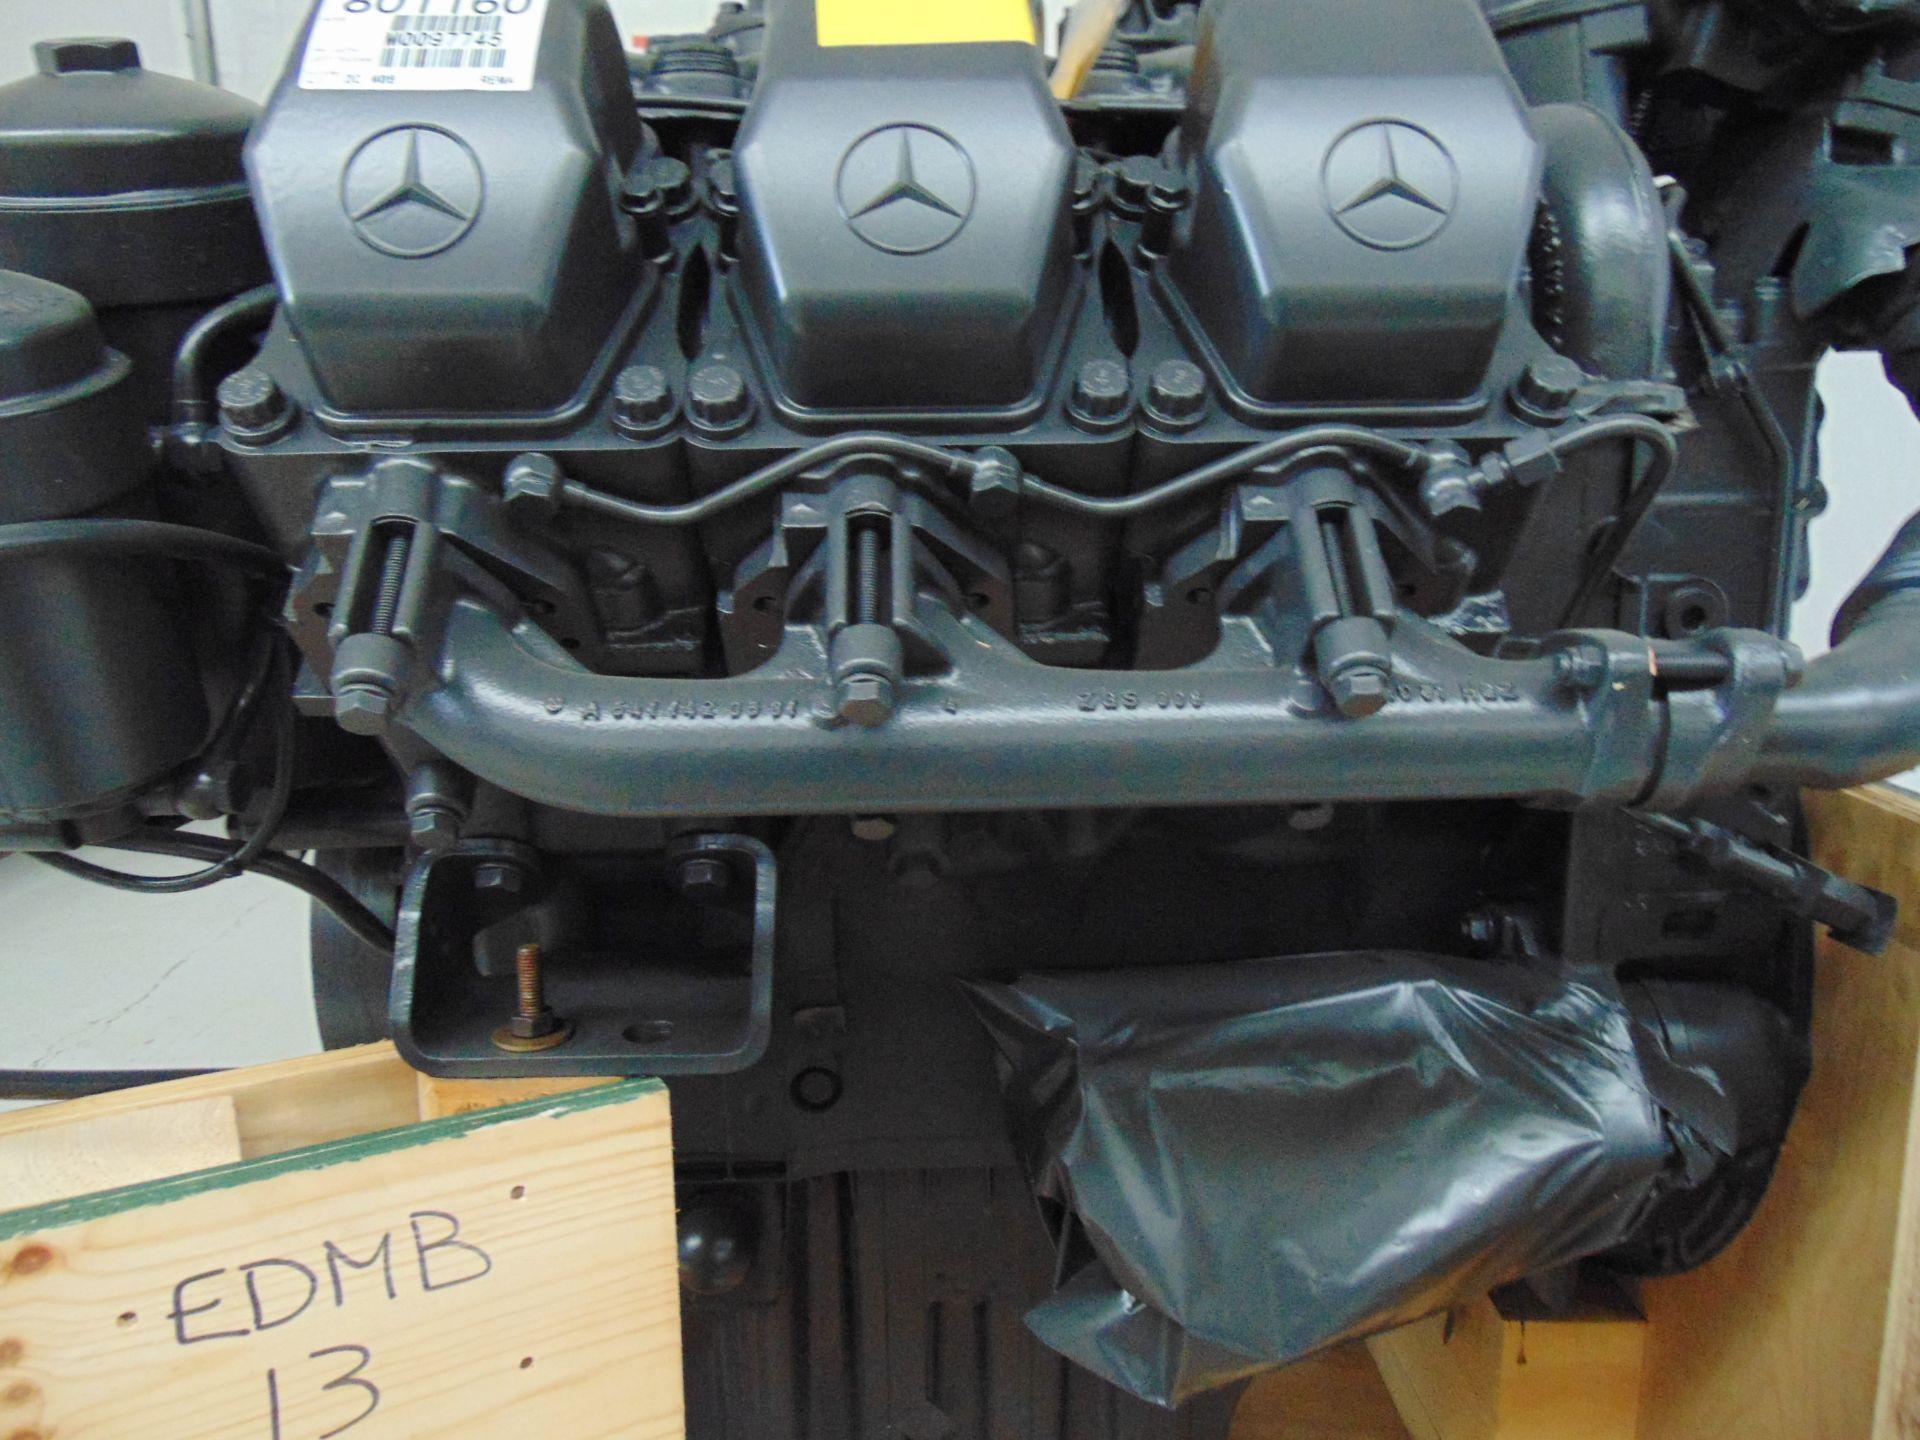 Lot 10 - Brand New & Unused Mercedes-Benz OM501LA V6 Turbo Diesel Engine